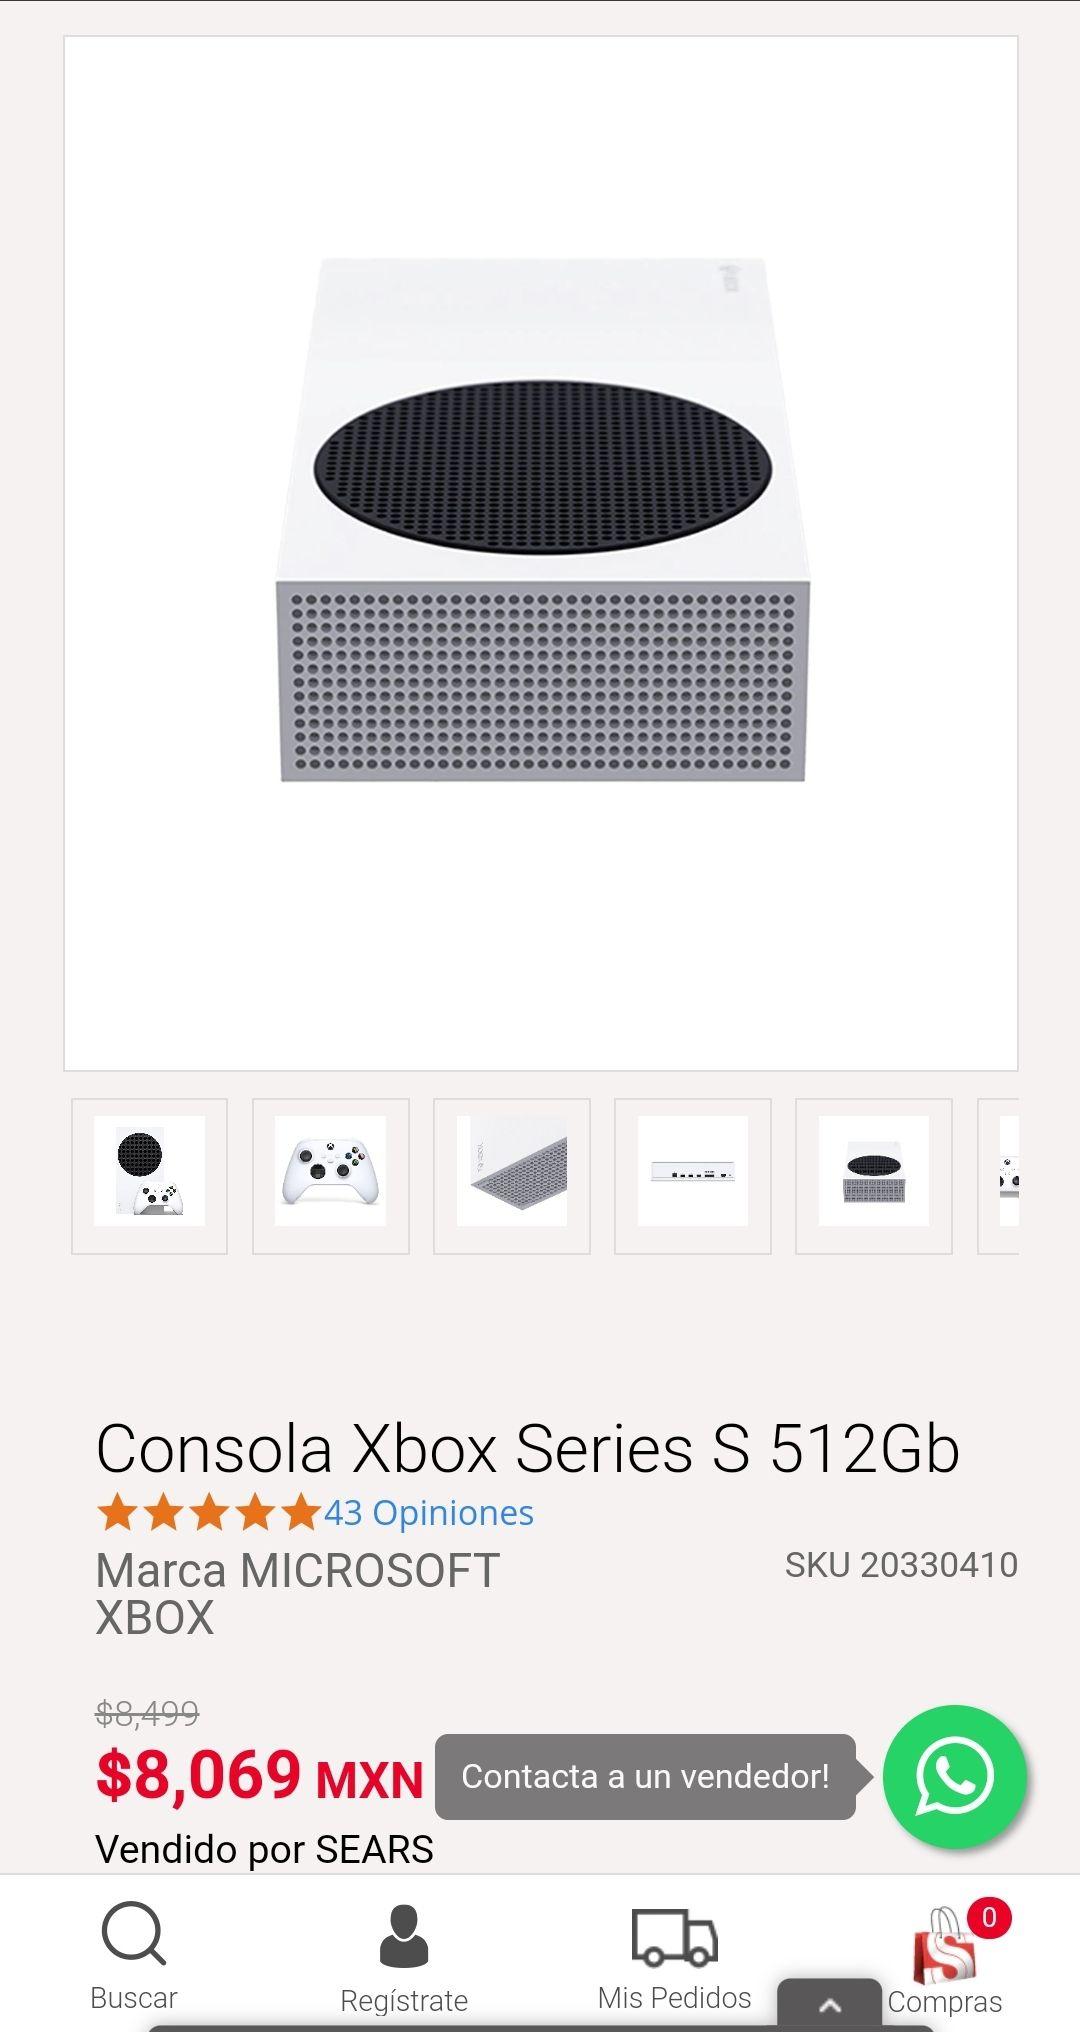 Sears: Consola Xbox Series S